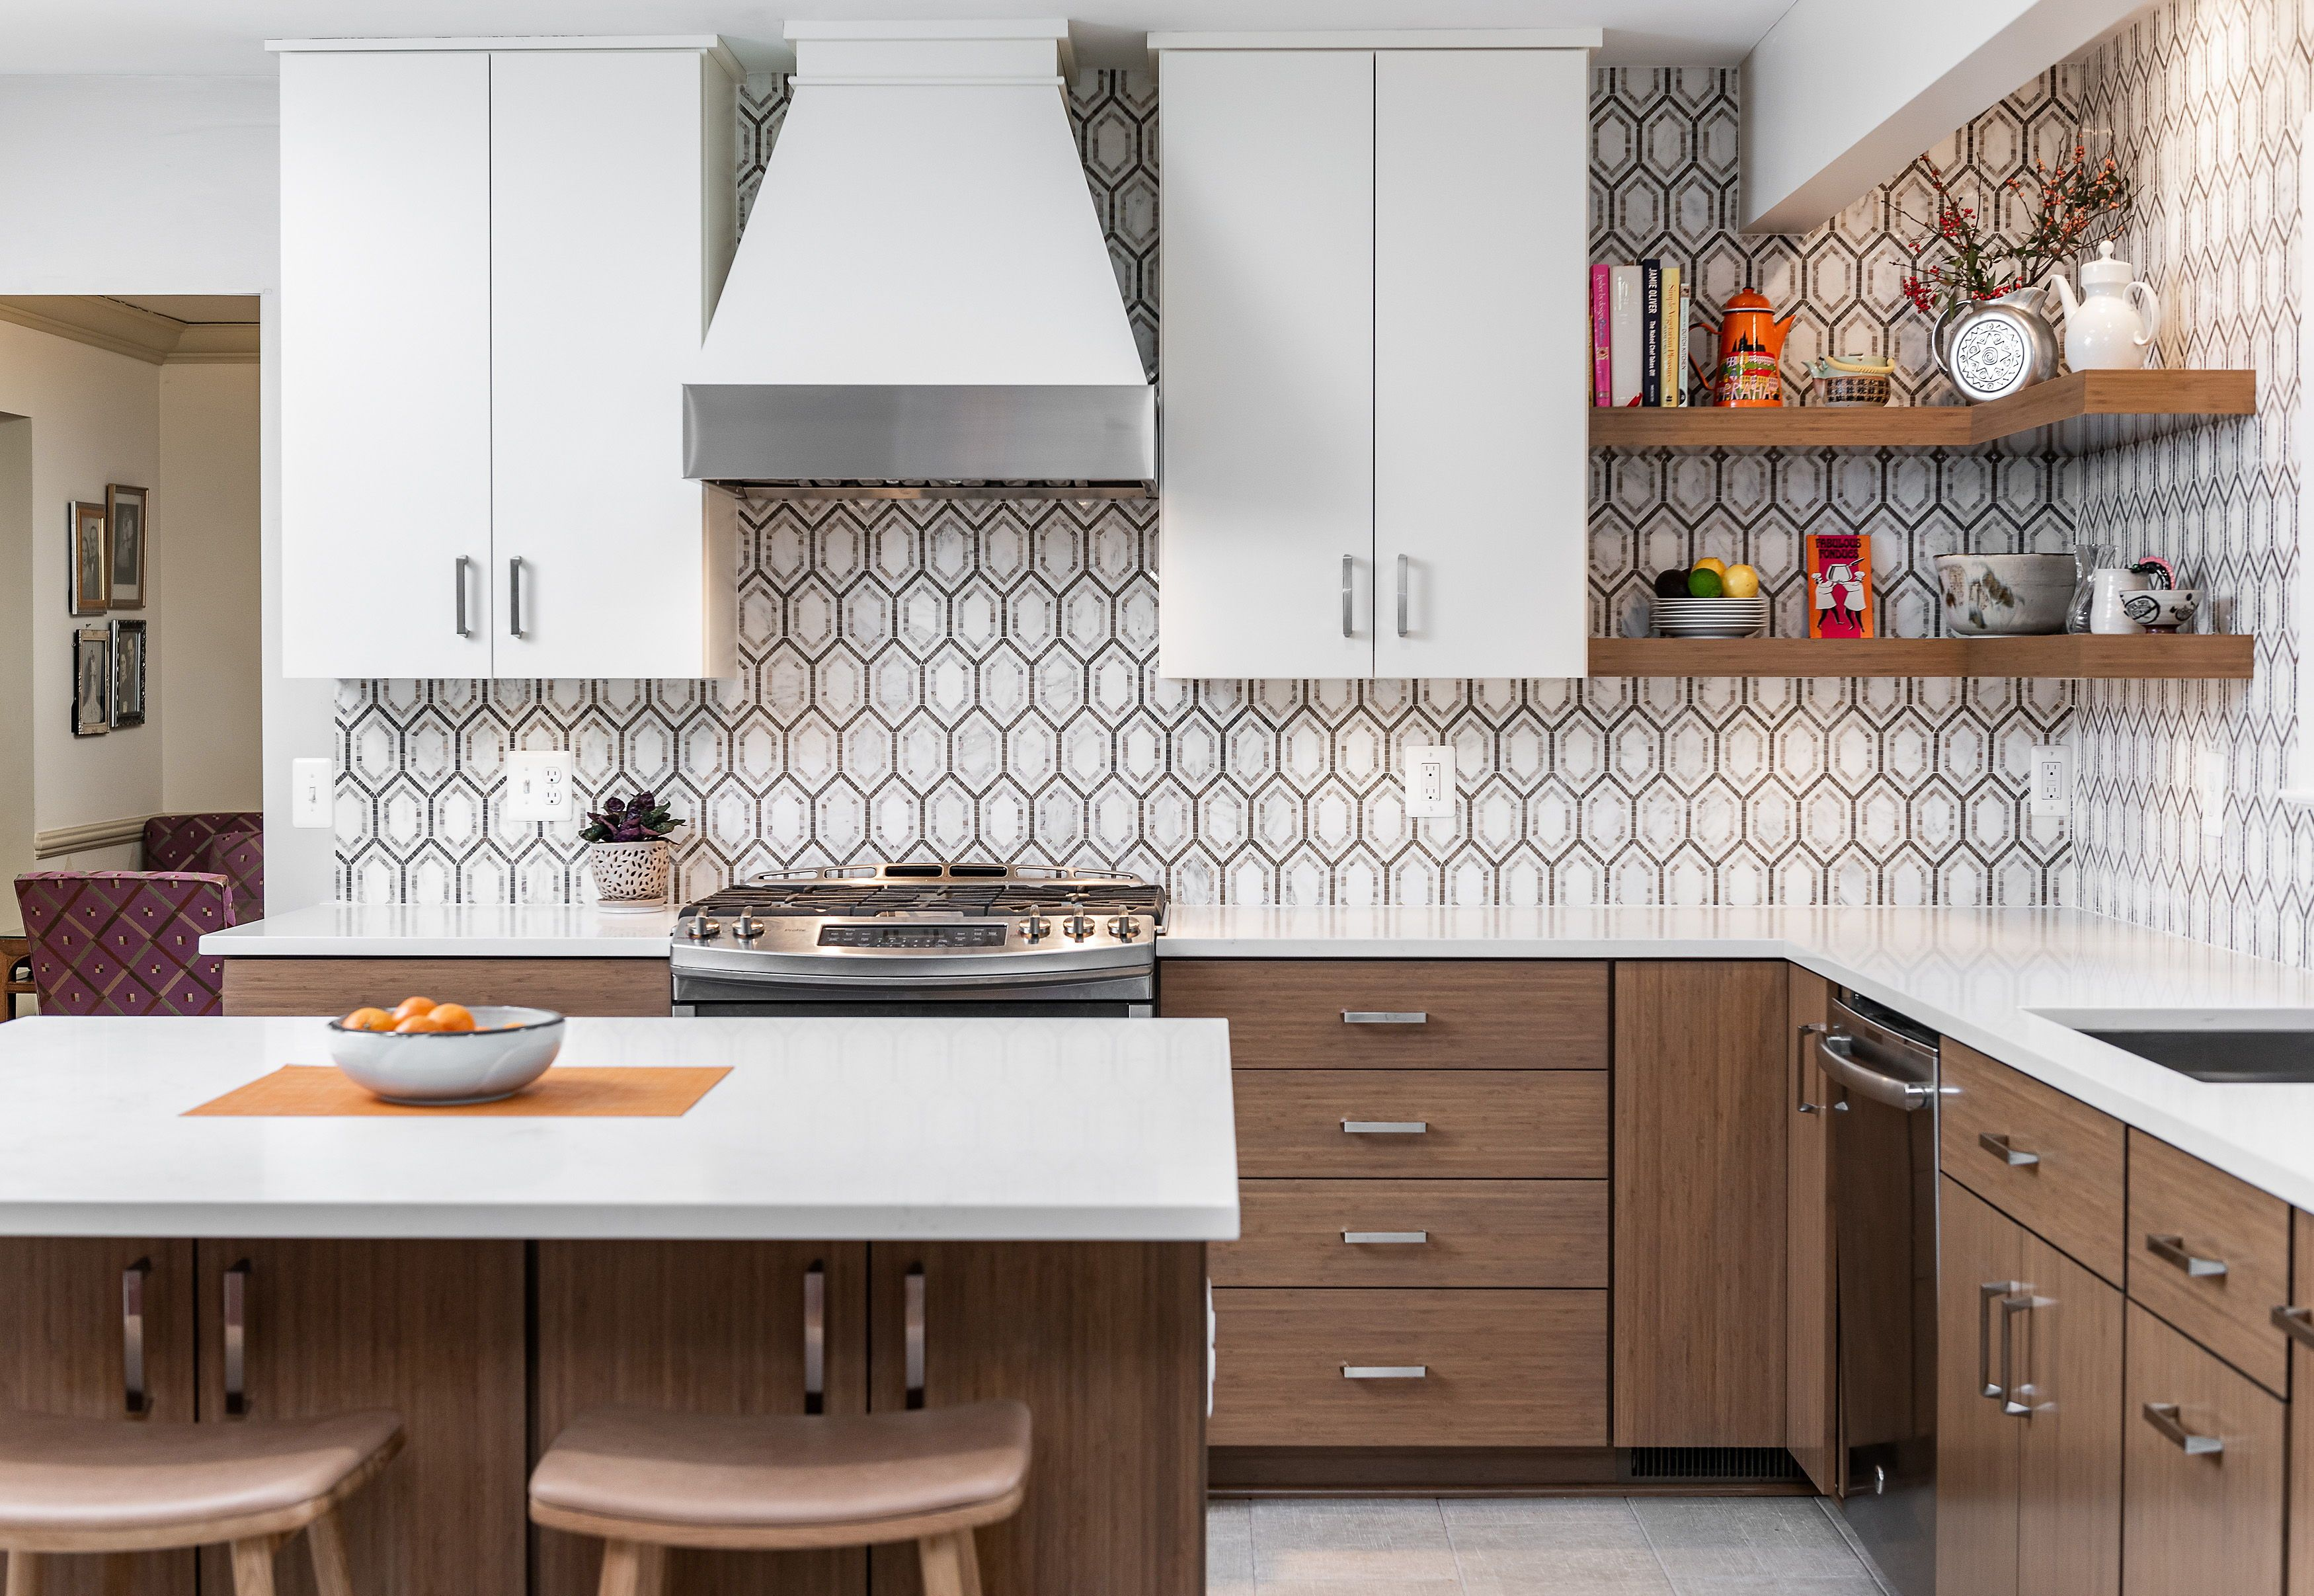 Baltimore Md K S Renewal Systems Llc In 2020 Contemporary Kitchen Modern Kitchen White Quartz Countertop